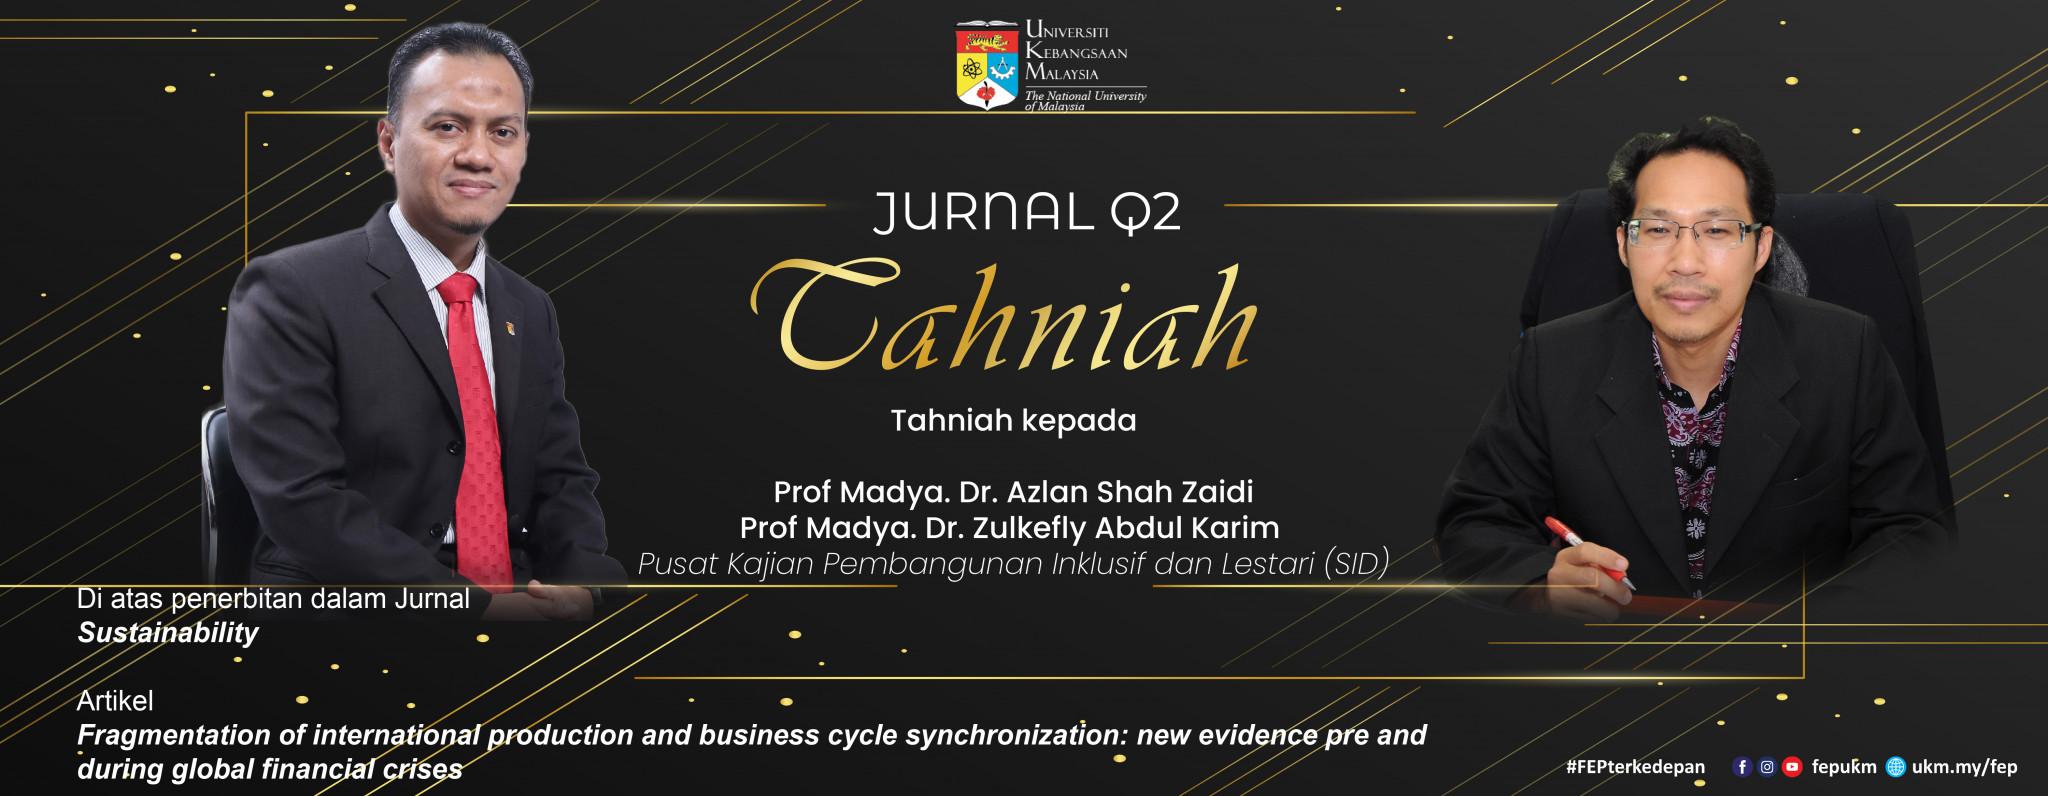 Tahniah Jurnal Q2